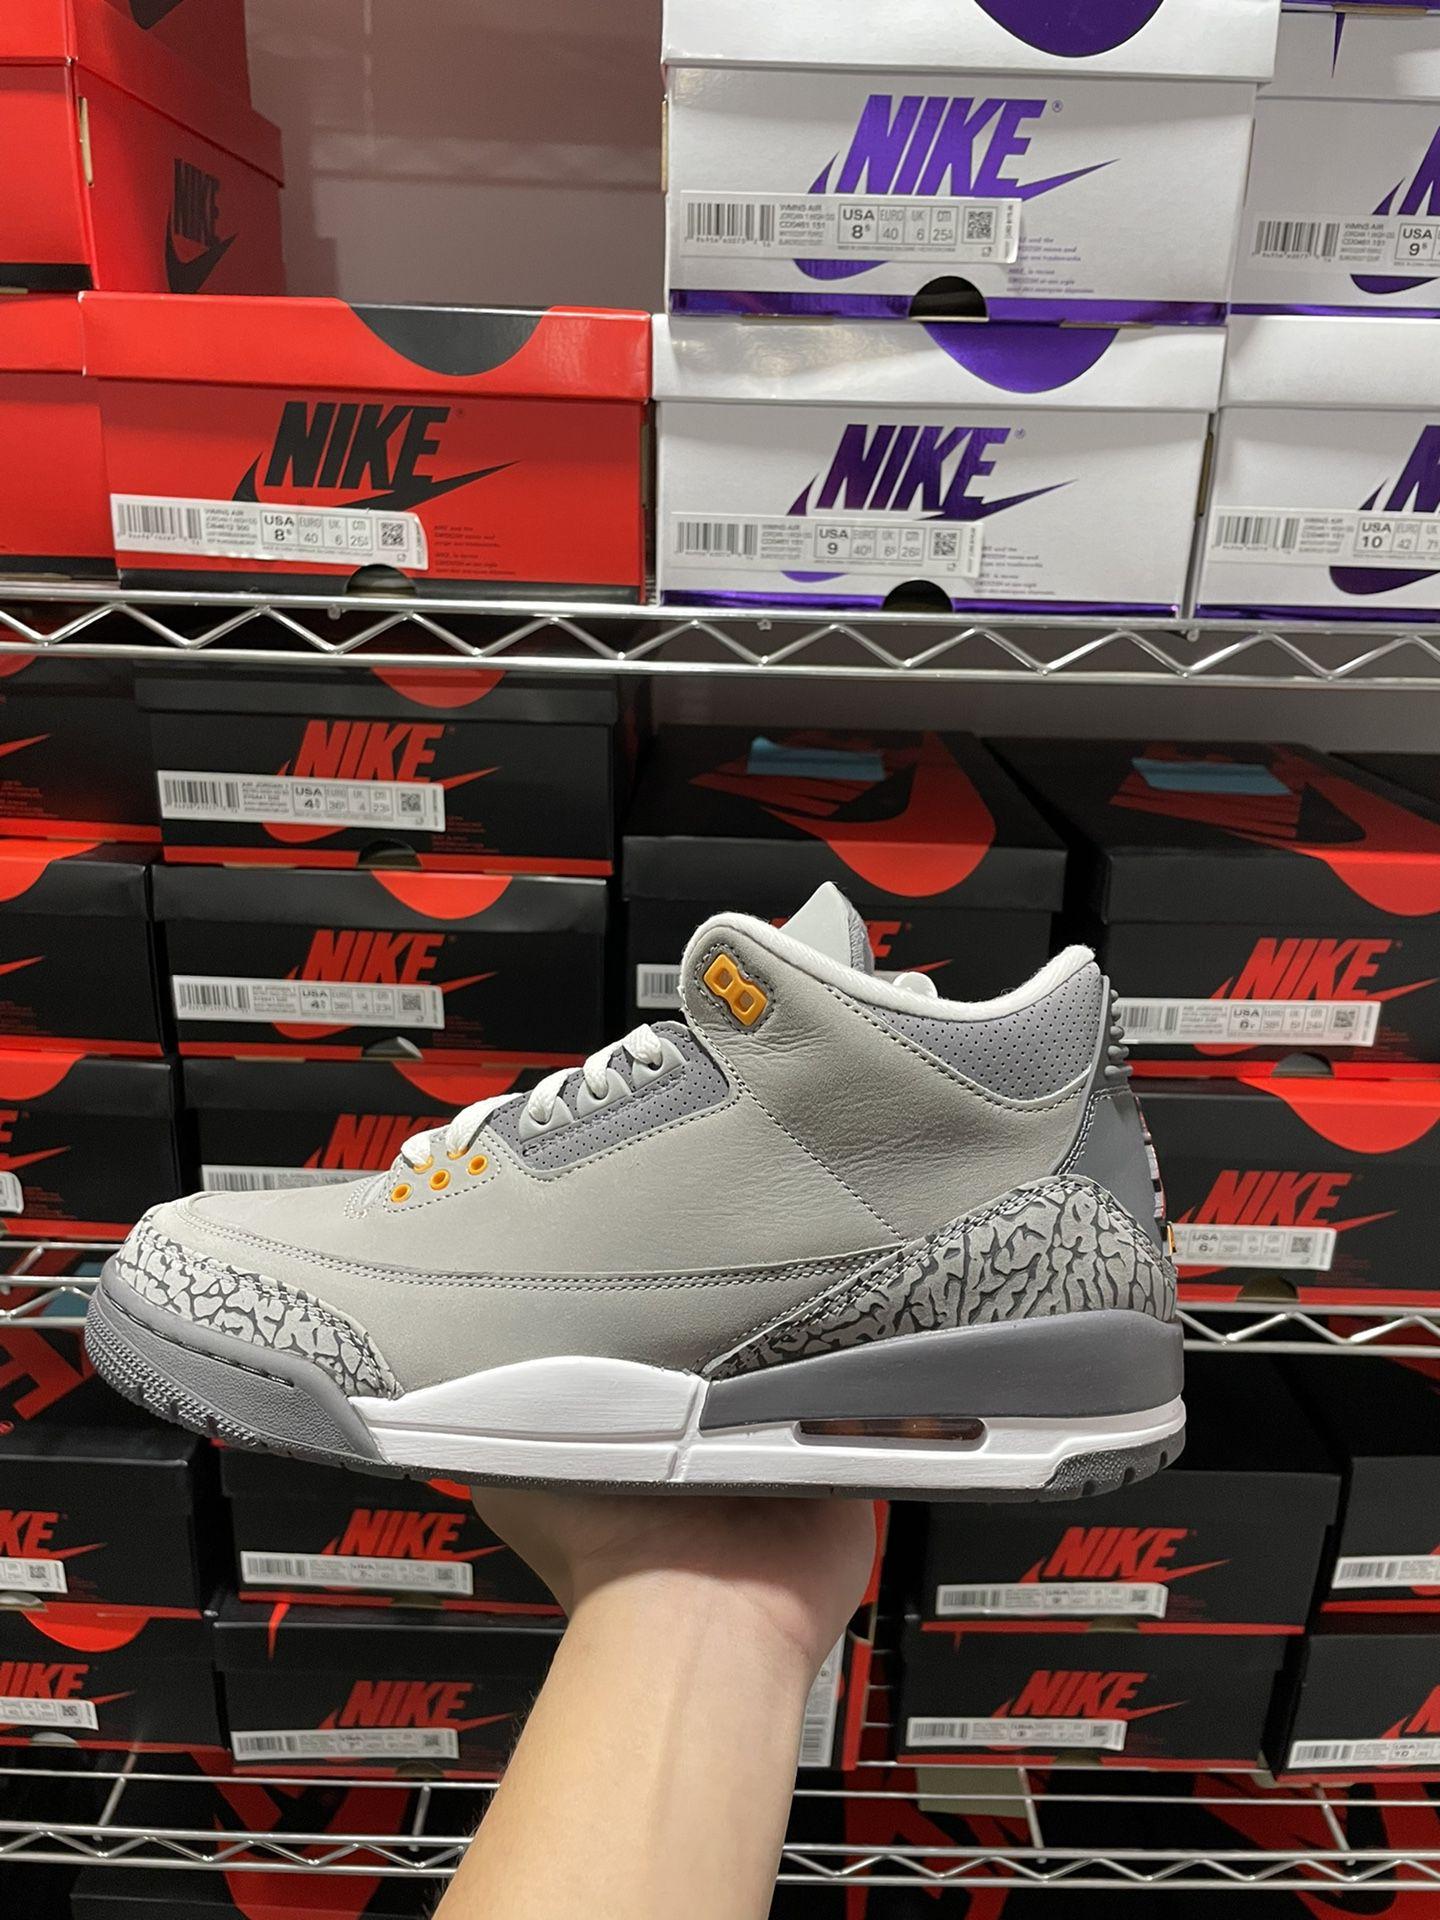 Jordan 3 Cool Grey Size 10.5